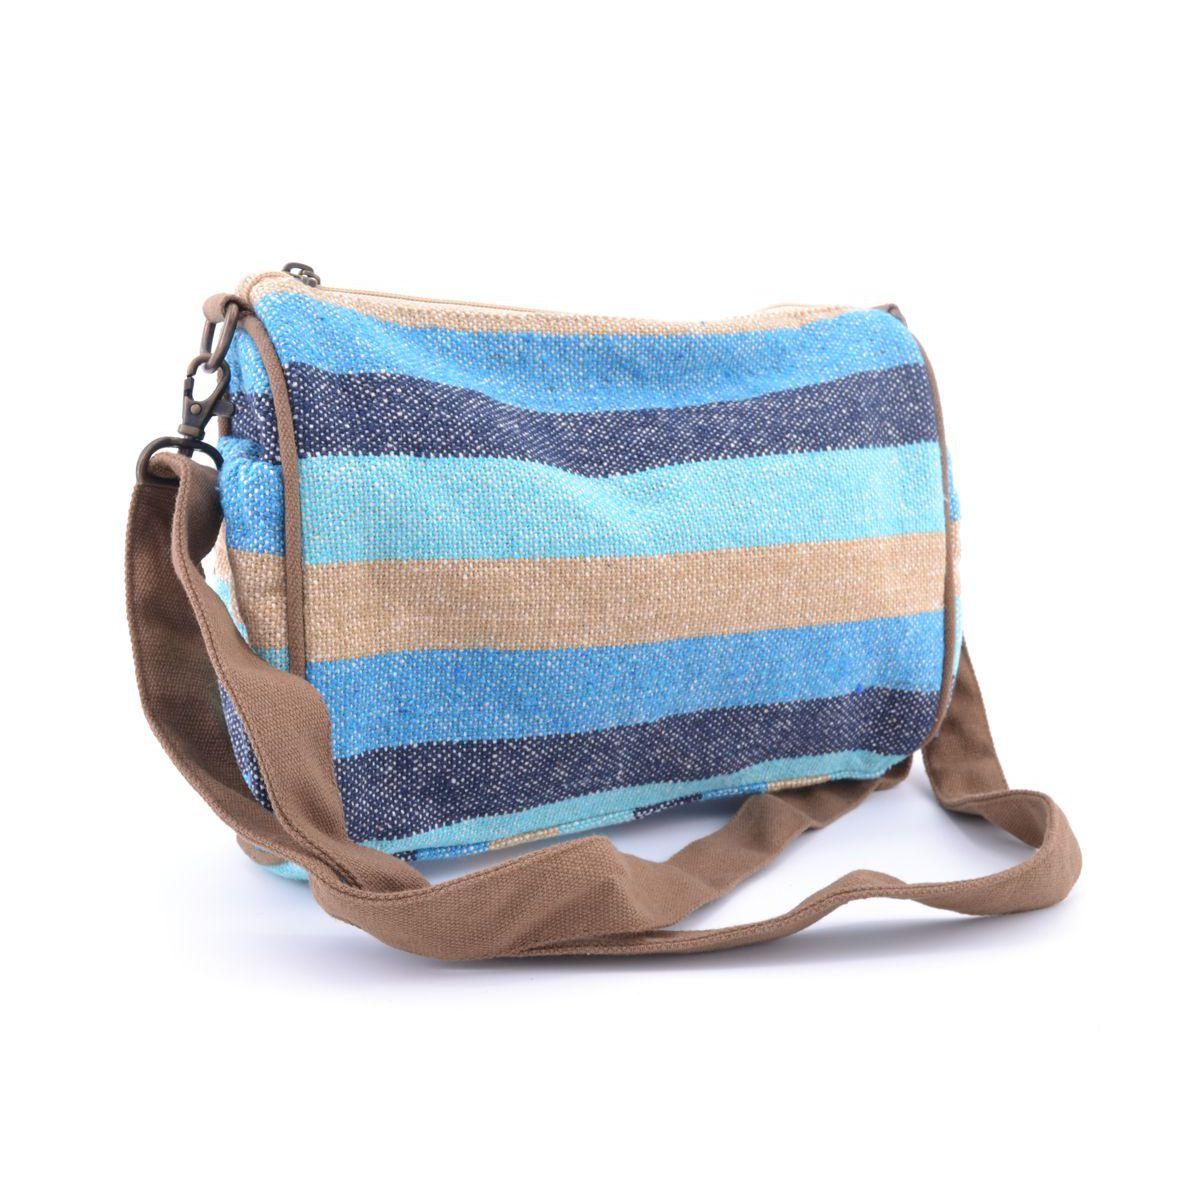 Cotton shoulder bag E19B205 Blue VestoPazzo